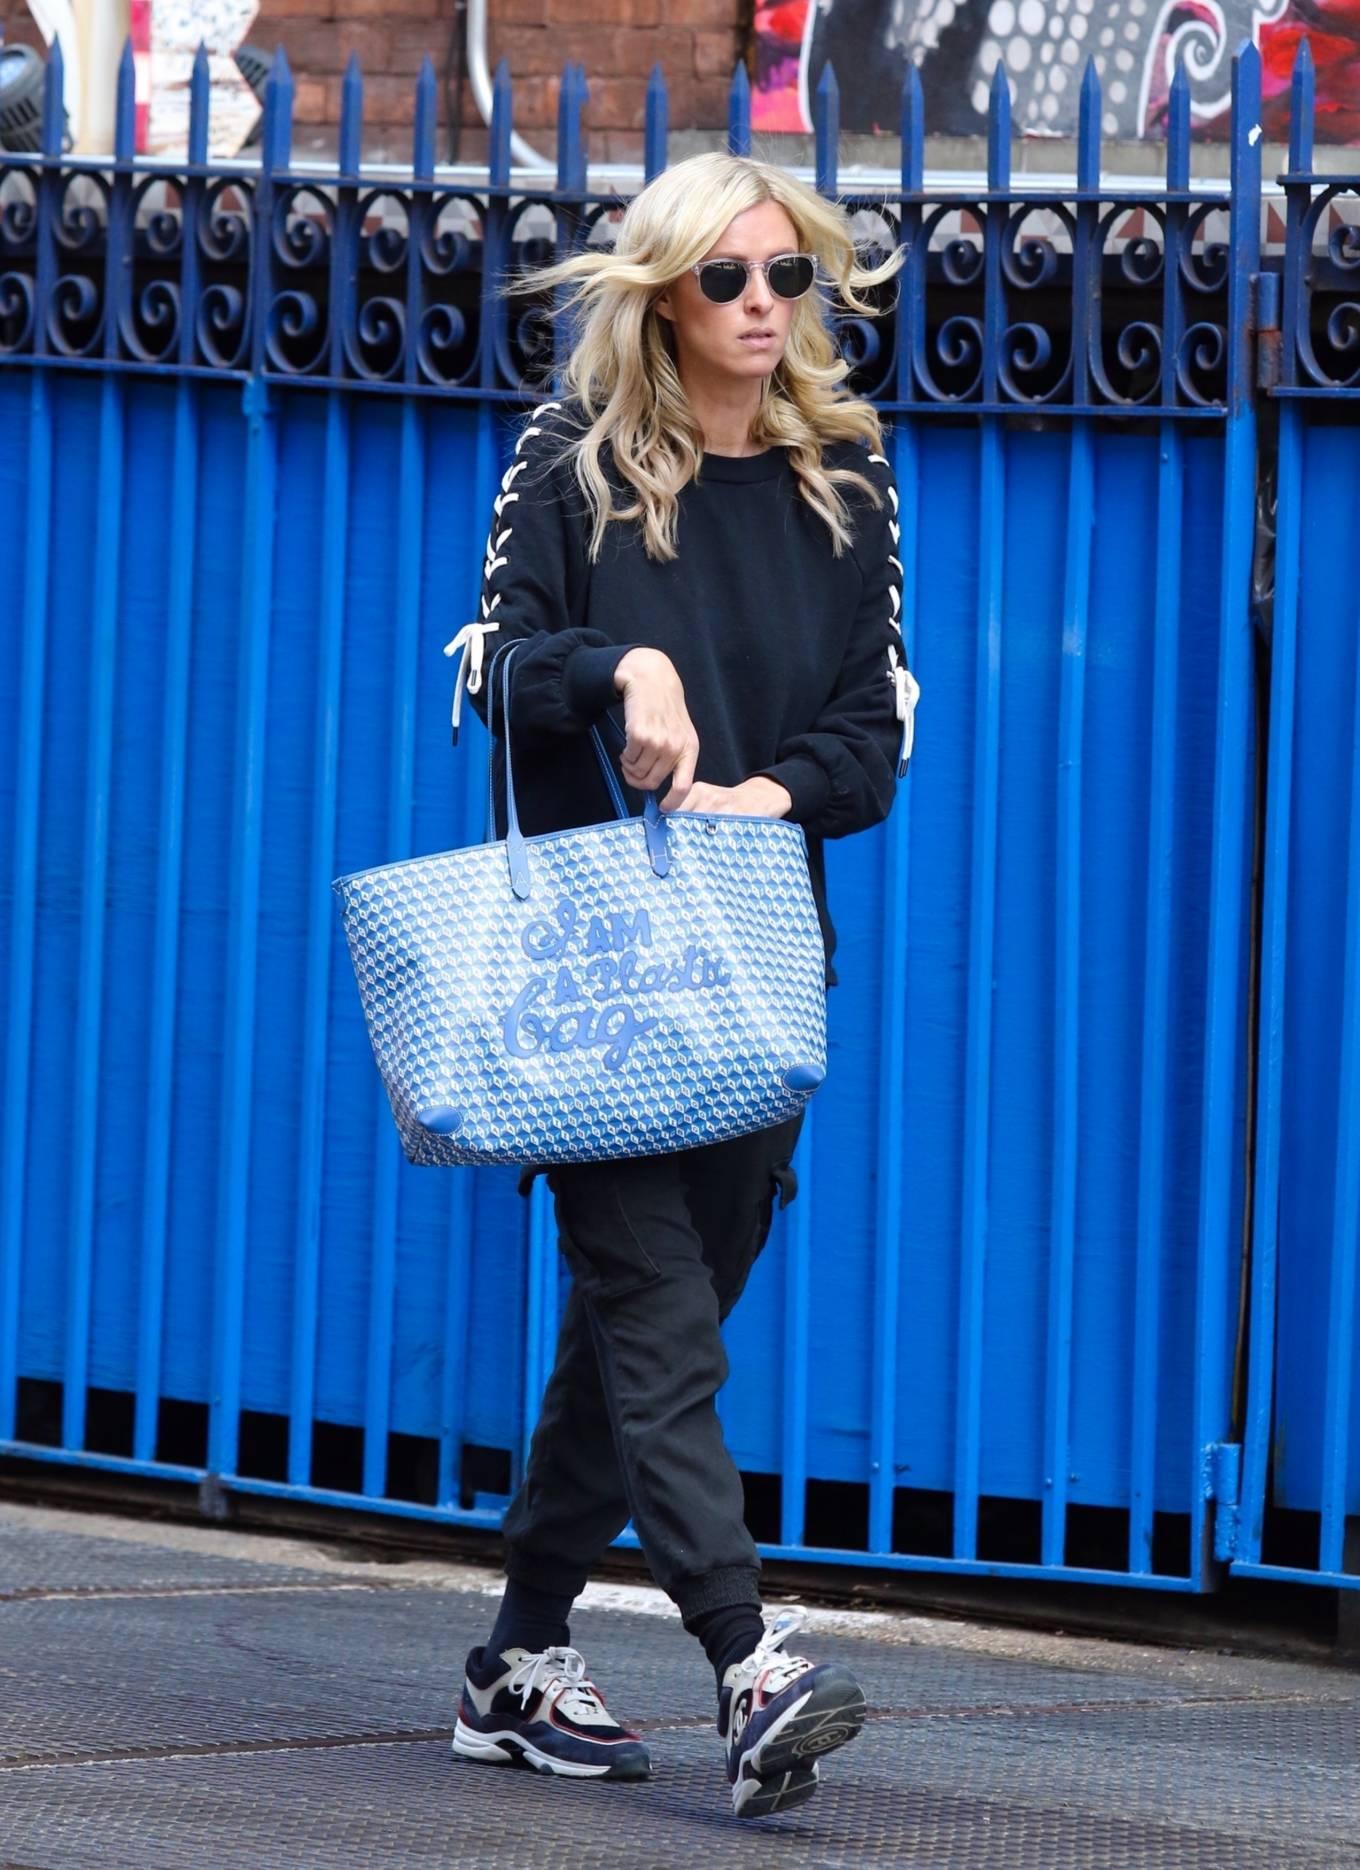 Nicky Hilton - Seen around Manhattan's Soho area